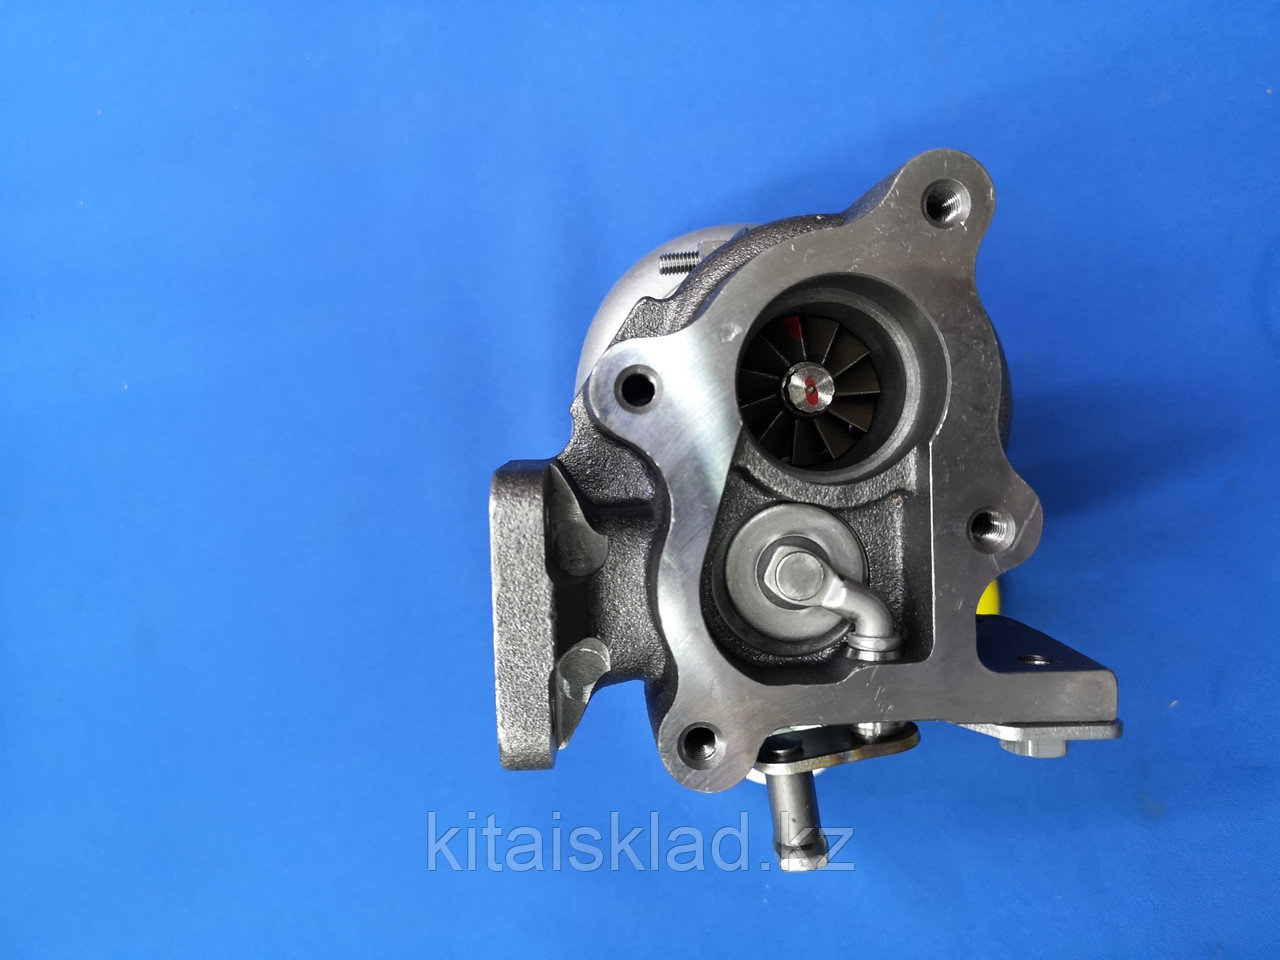 Турбина J44P 4YDAIKQ-014 двигатель YN485ZL